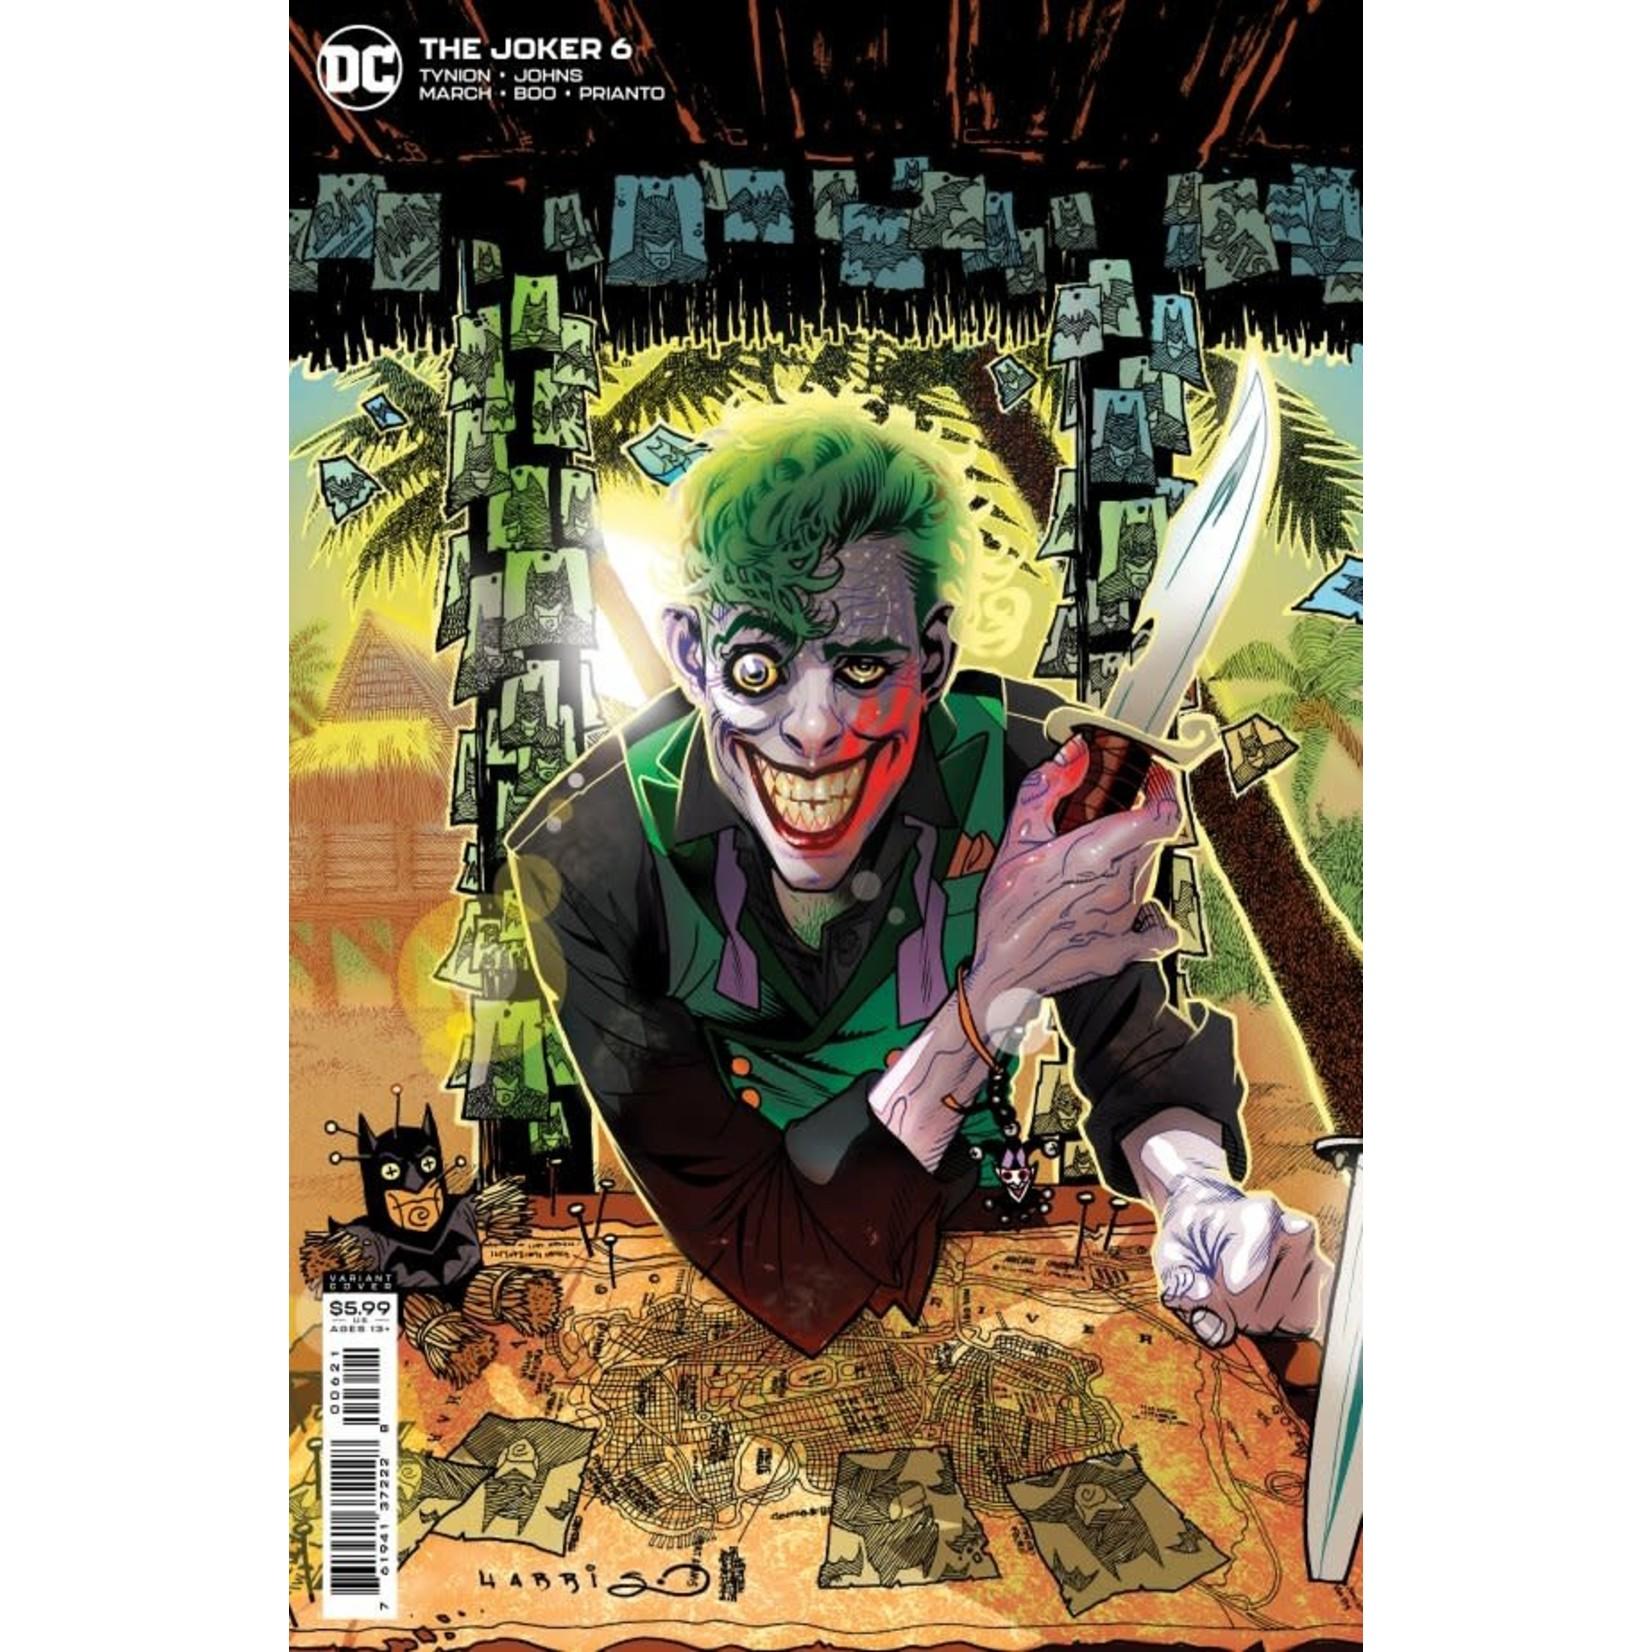 DC Comics The Joker #6 Cover B